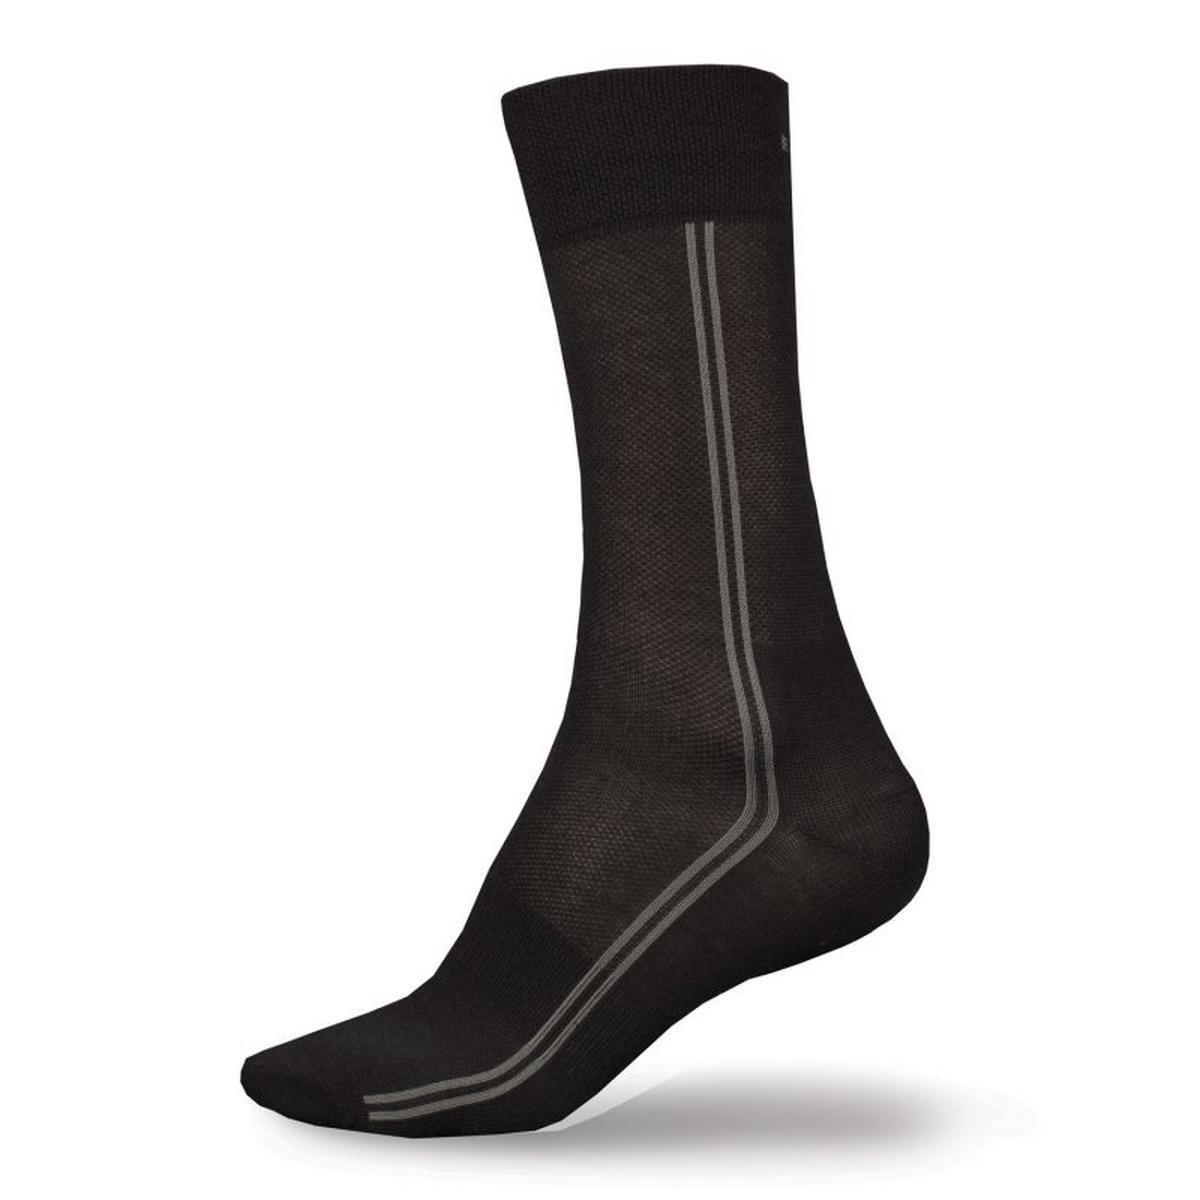 Endura Coolmax Long Sock - Black